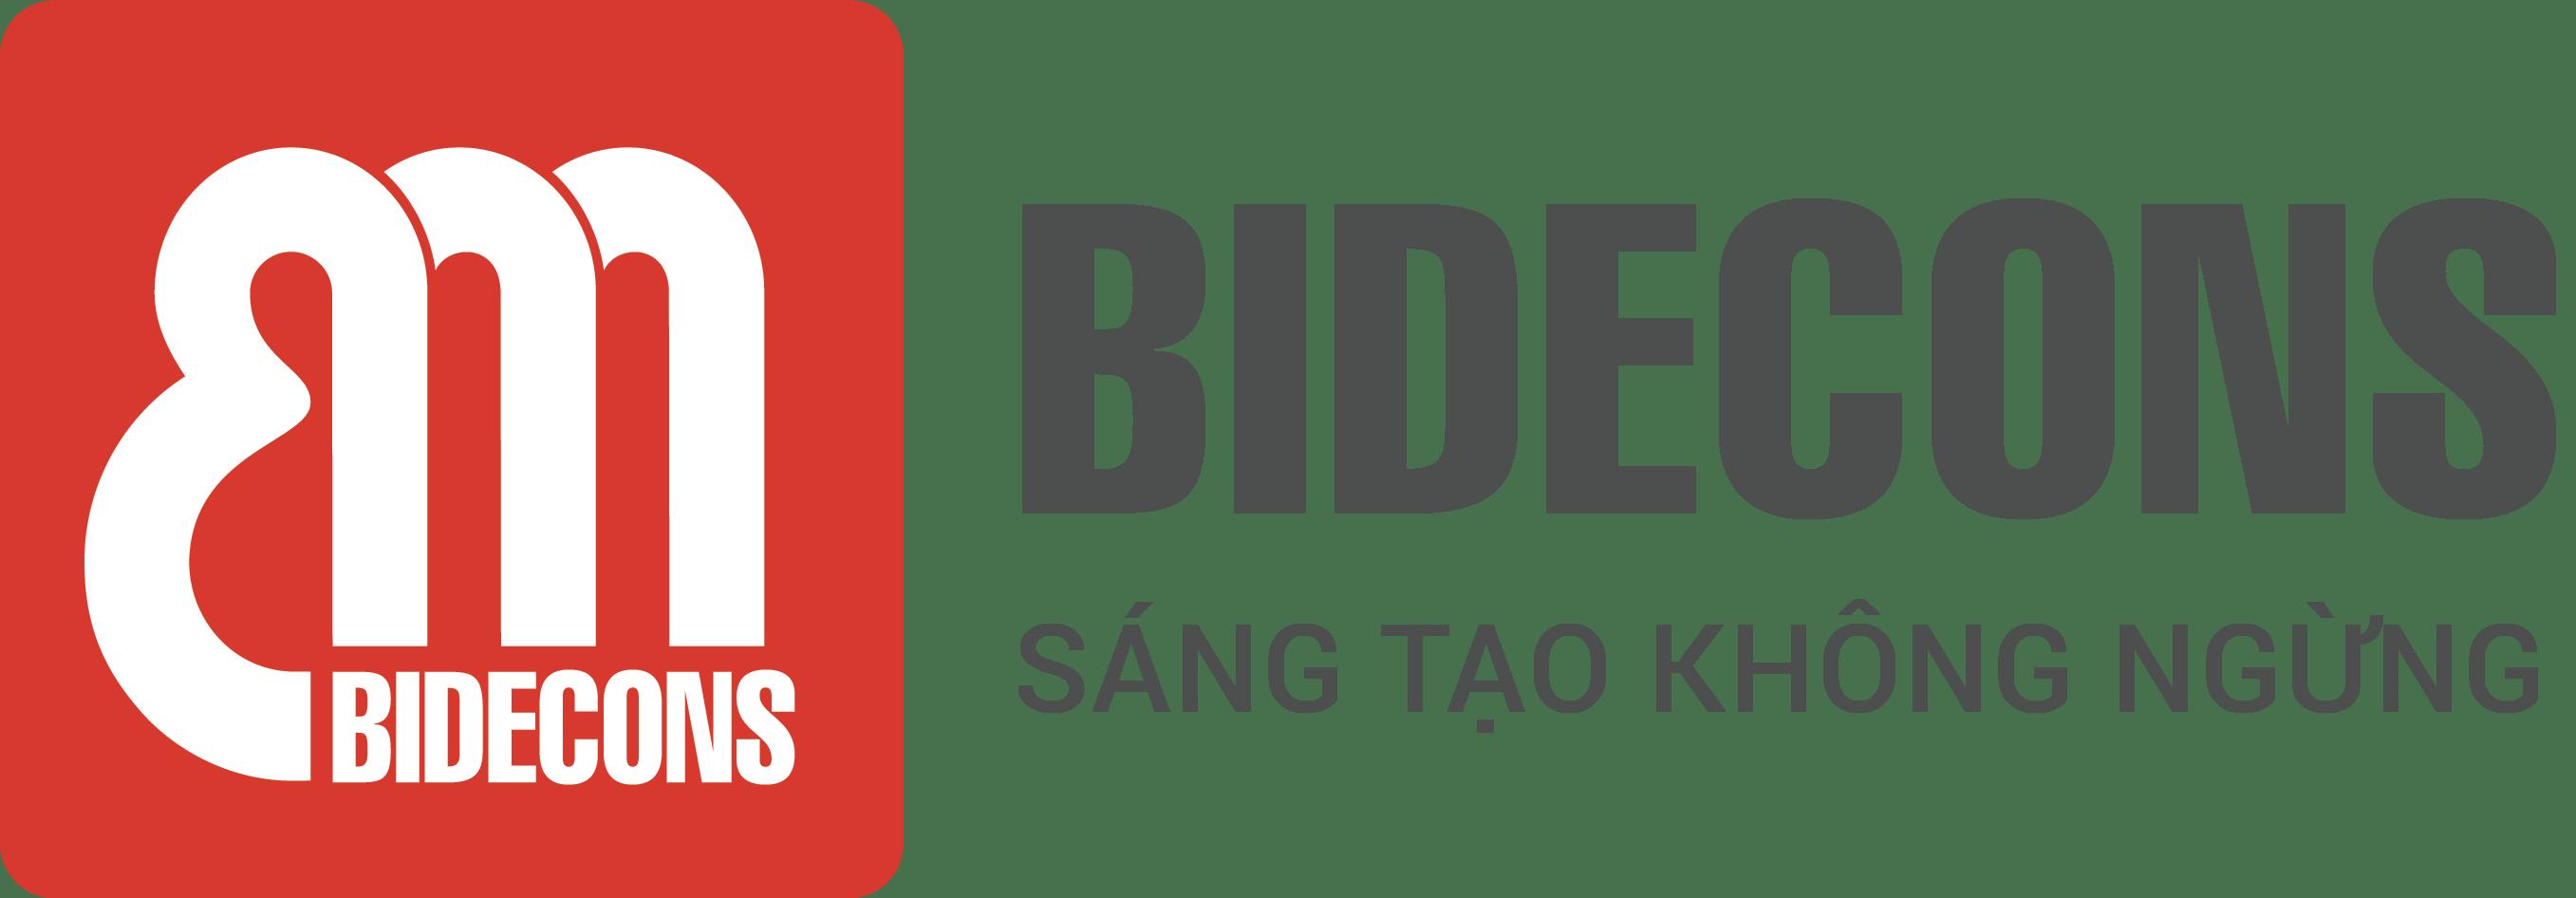 BIDECONS